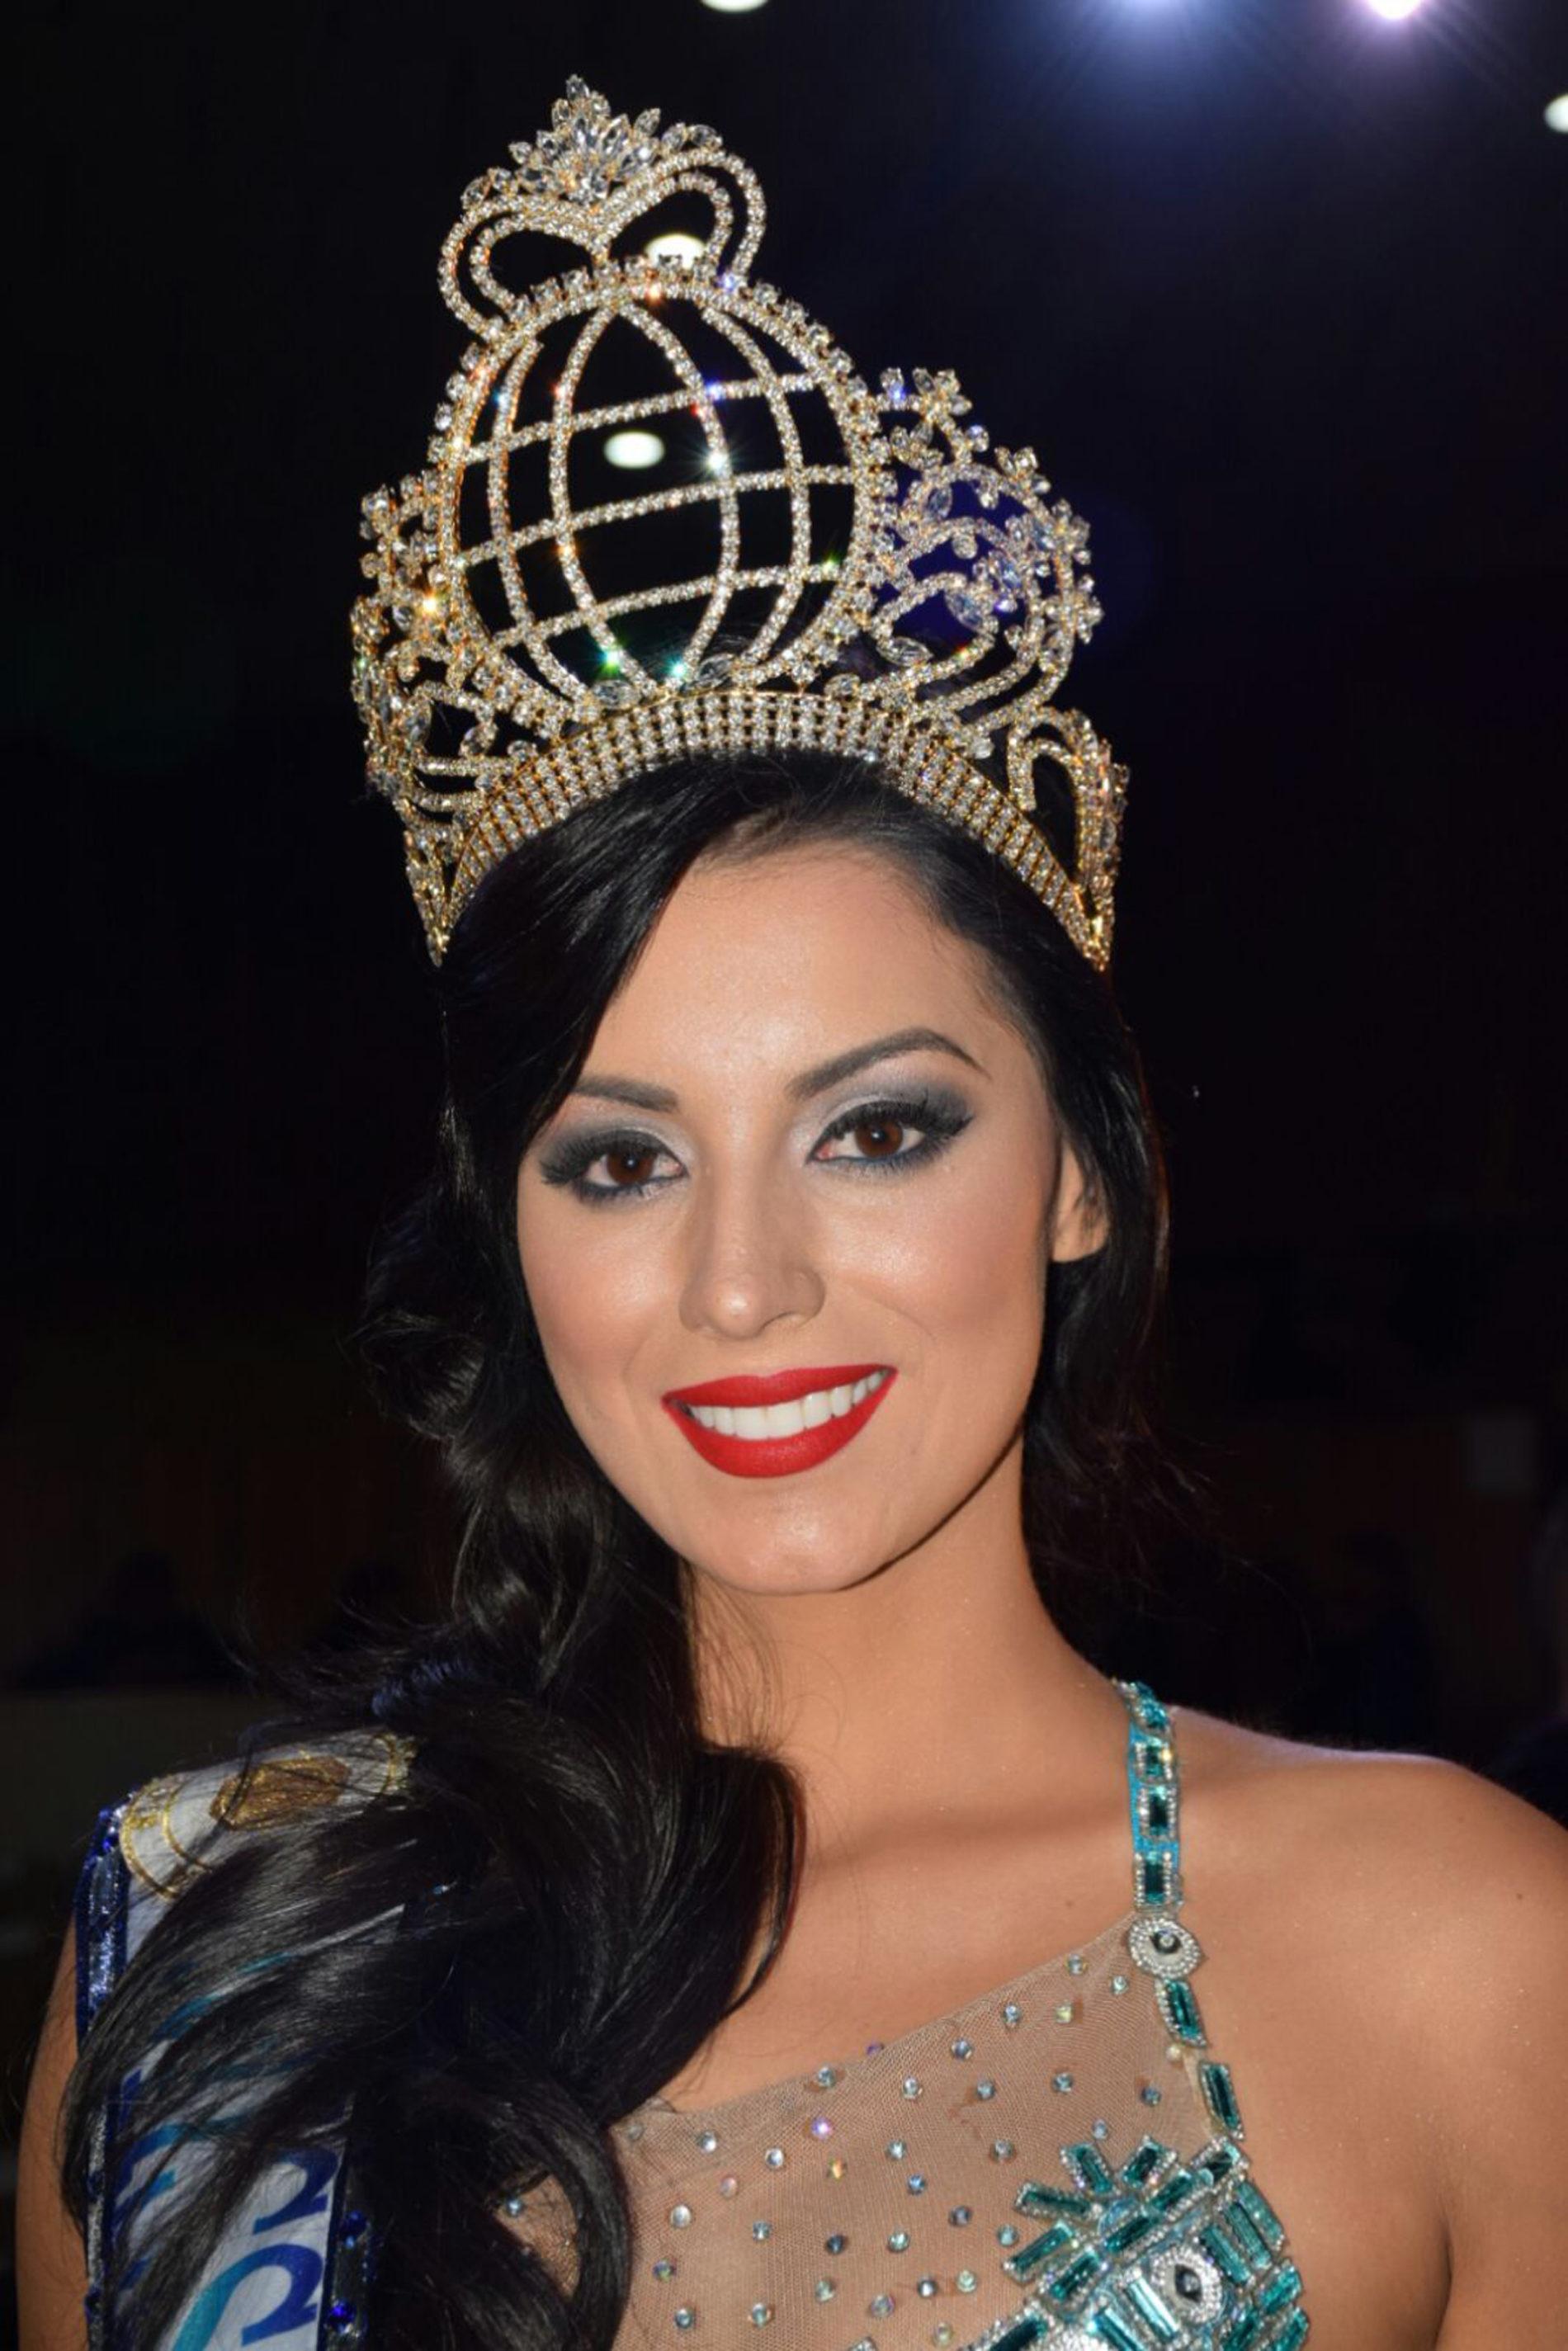 RISARALDA, NUEVA MISS MUNDO COLOMBIA